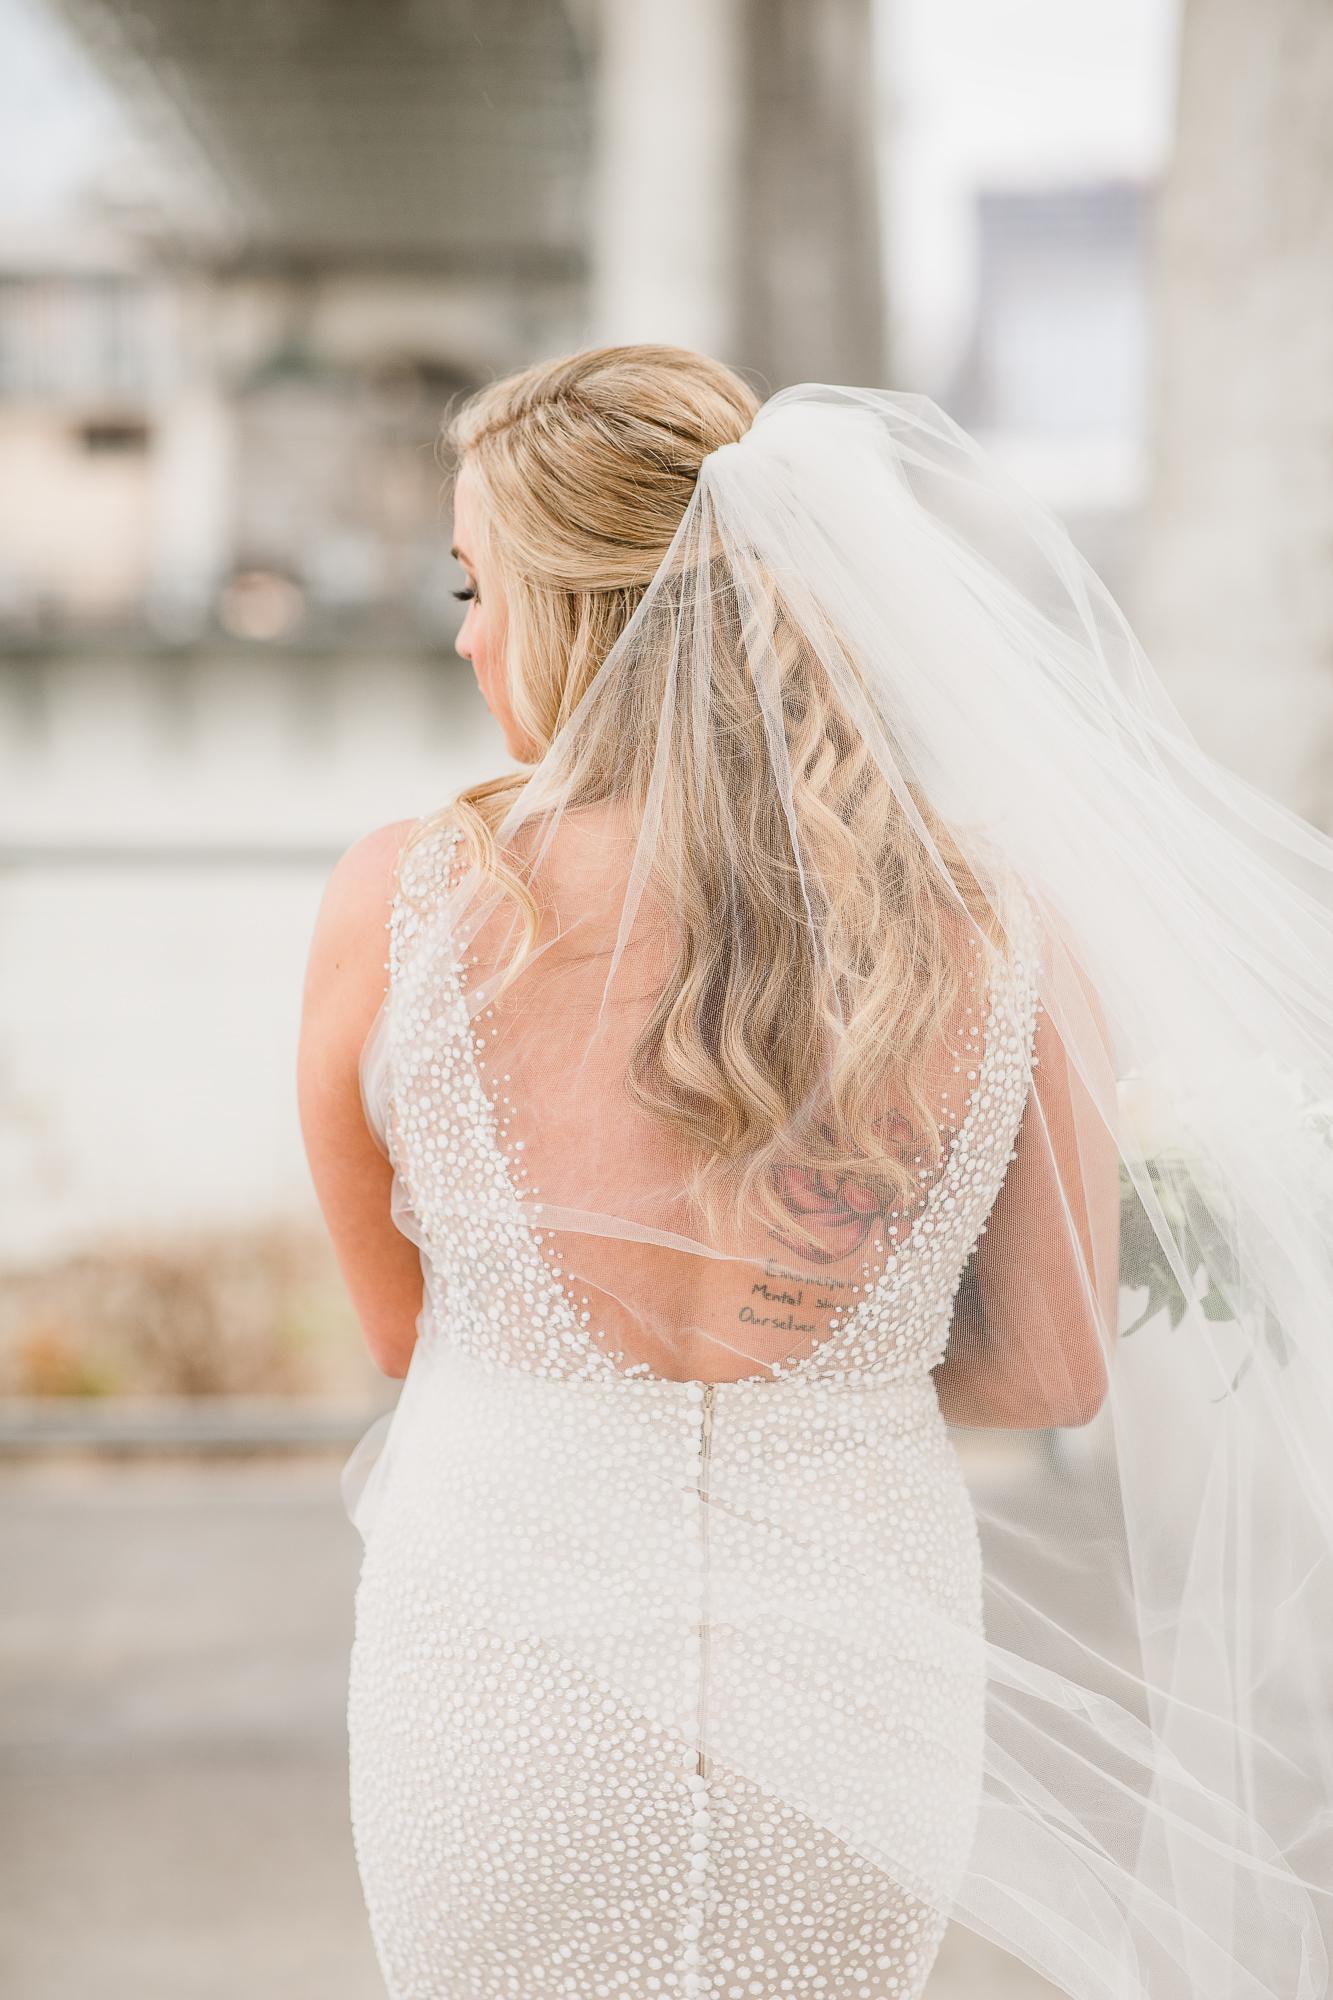 Pronovias Atelier Collection Wedding Dress | Nashville Bride Guide